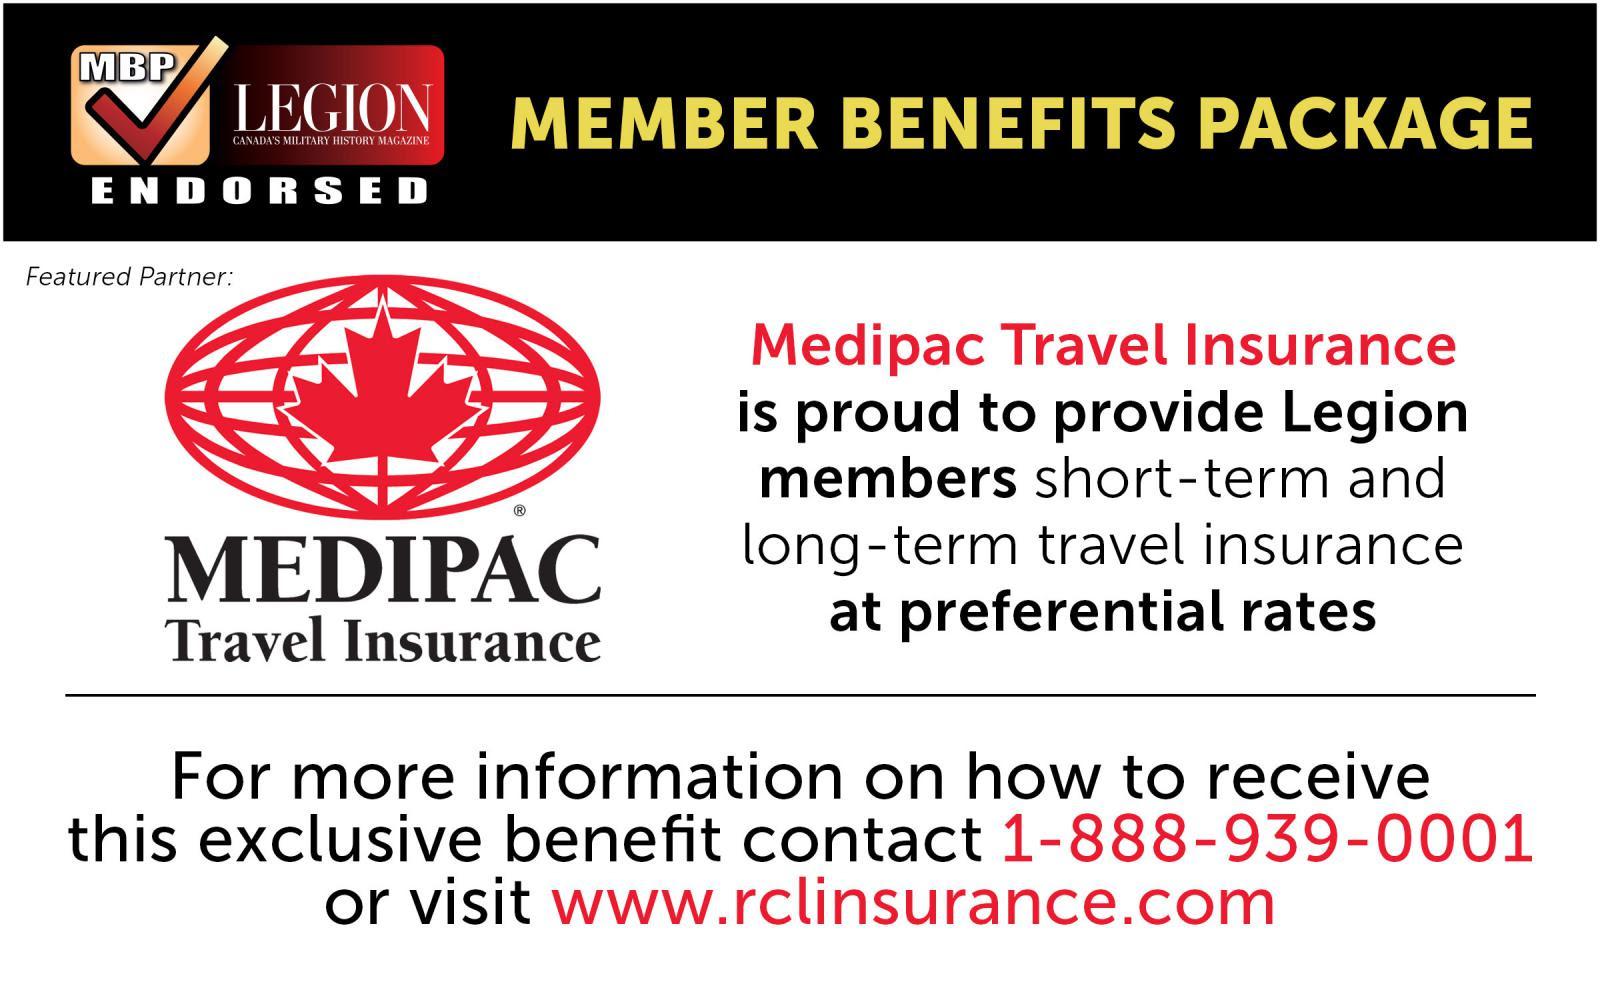 Medipac Travel Insurance